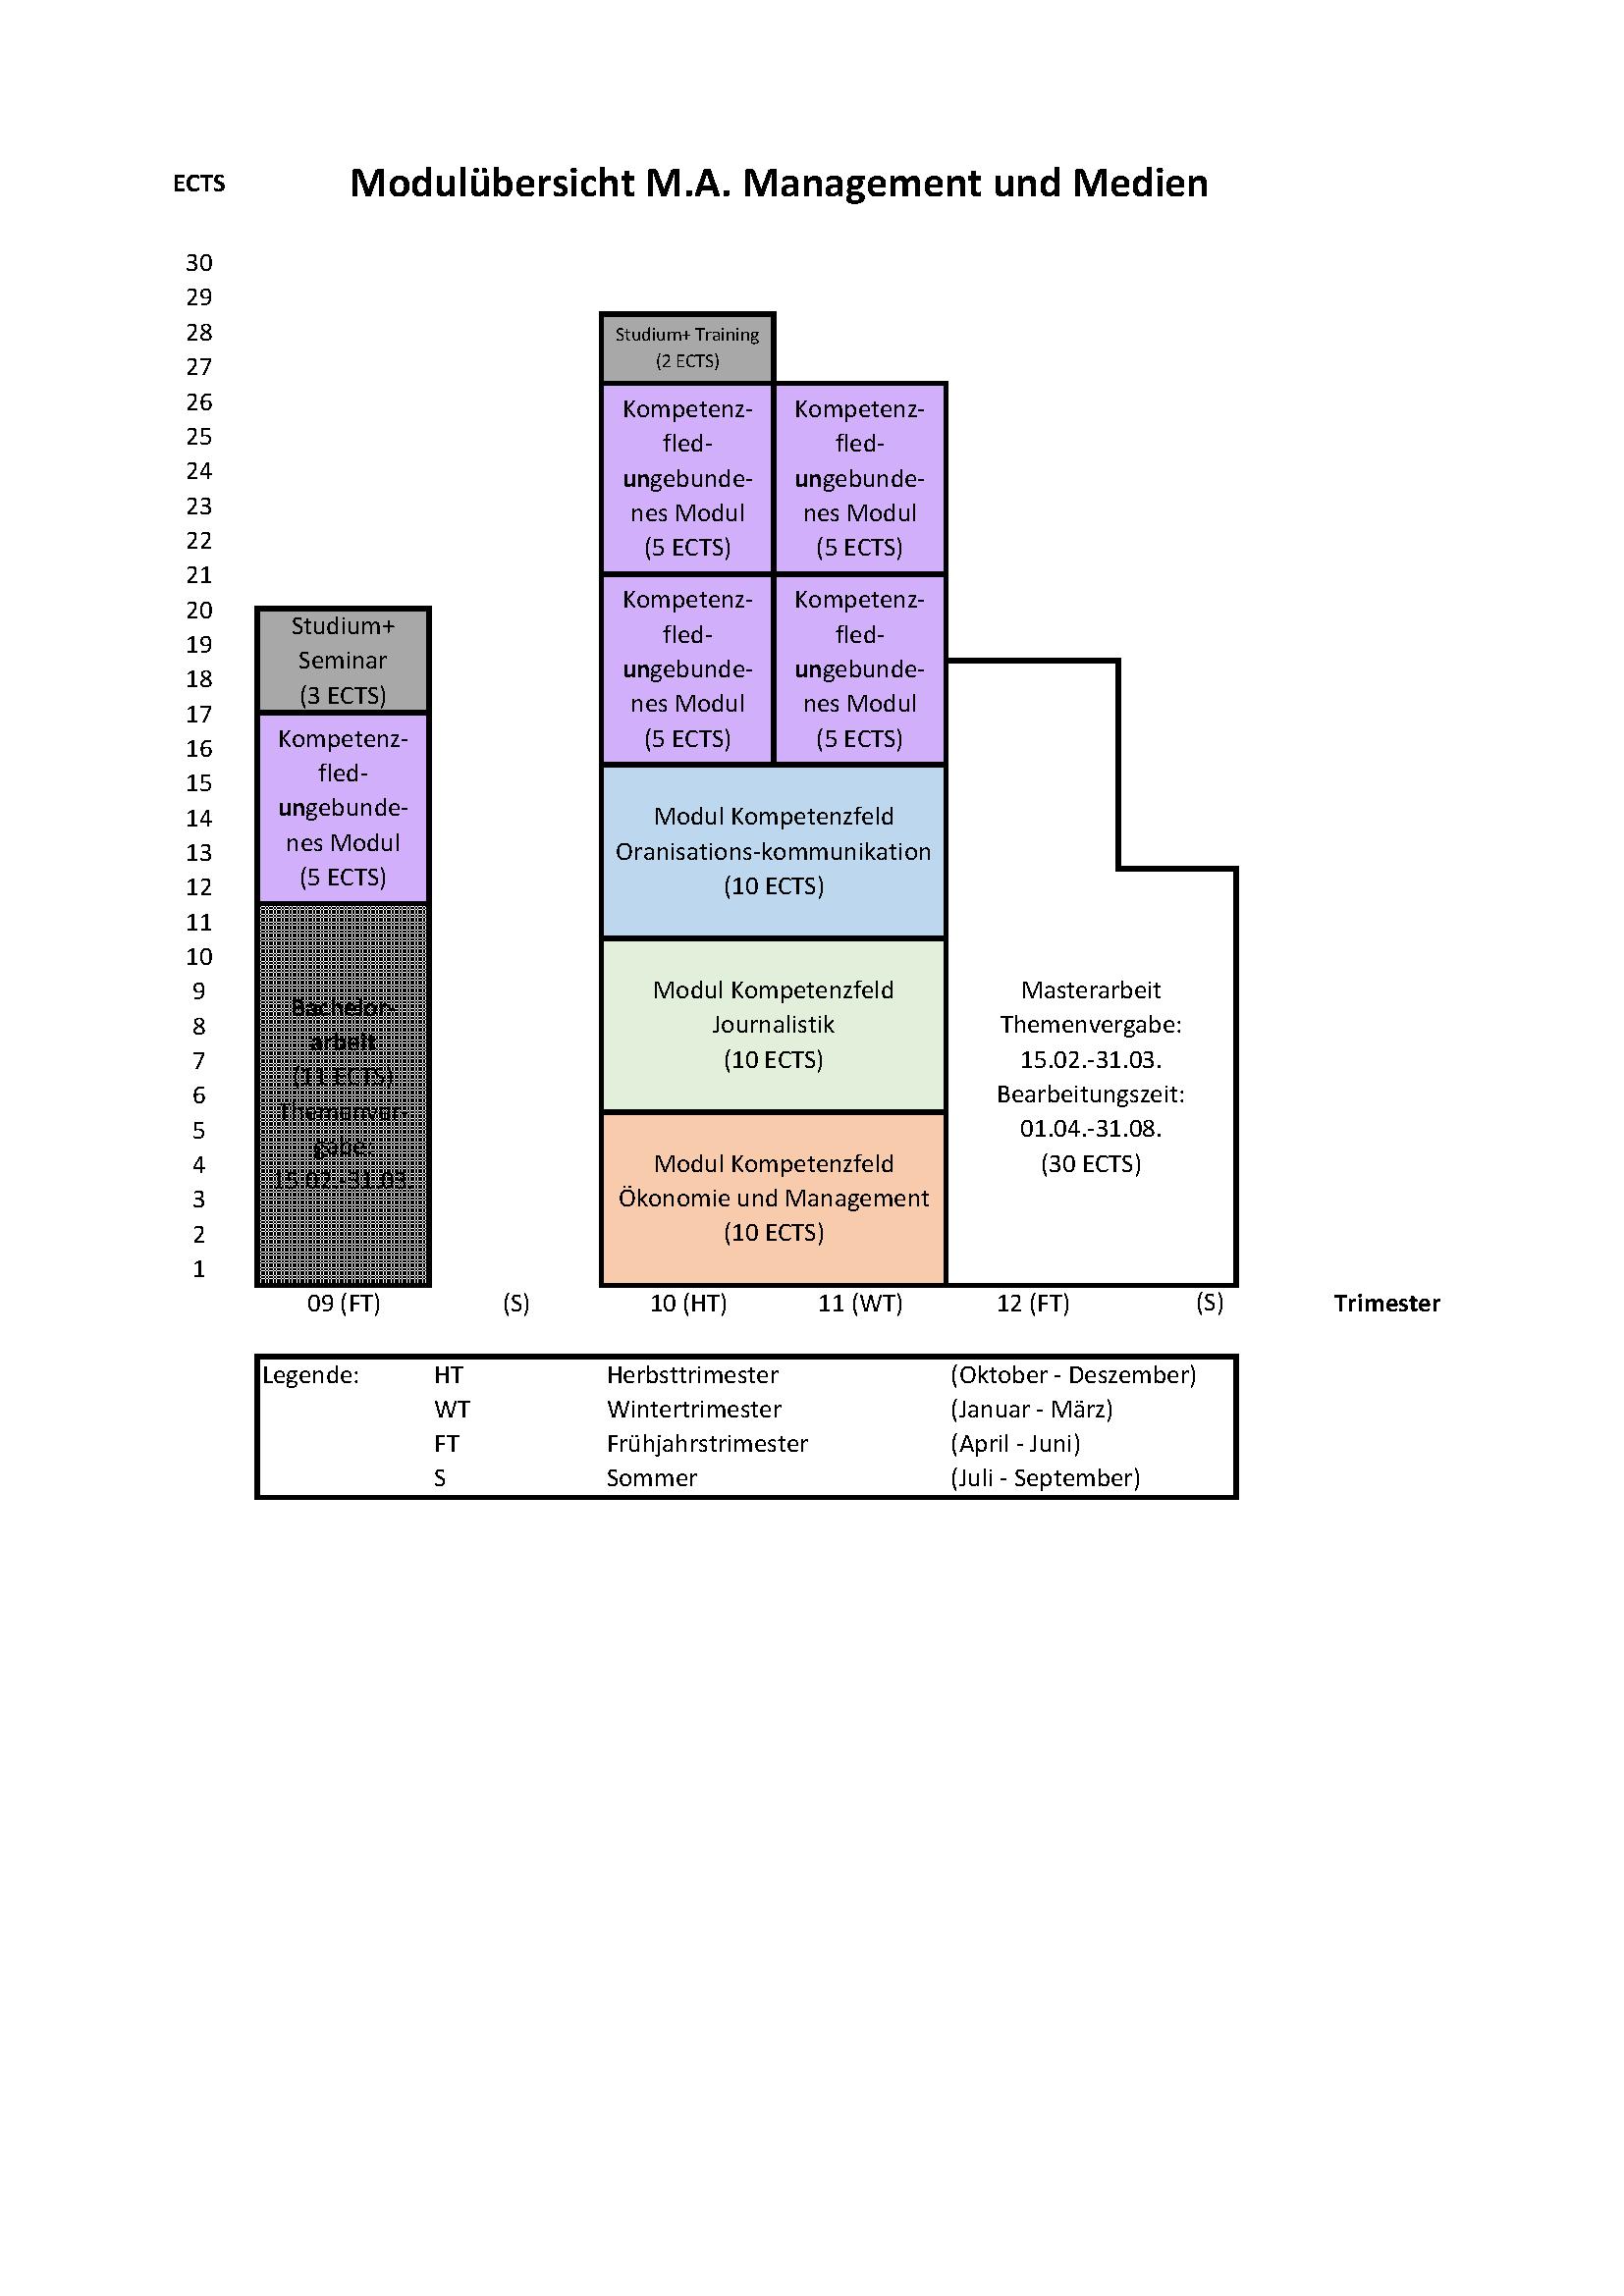 Modulübersicht M.A. (ab Jahrgang 2016)